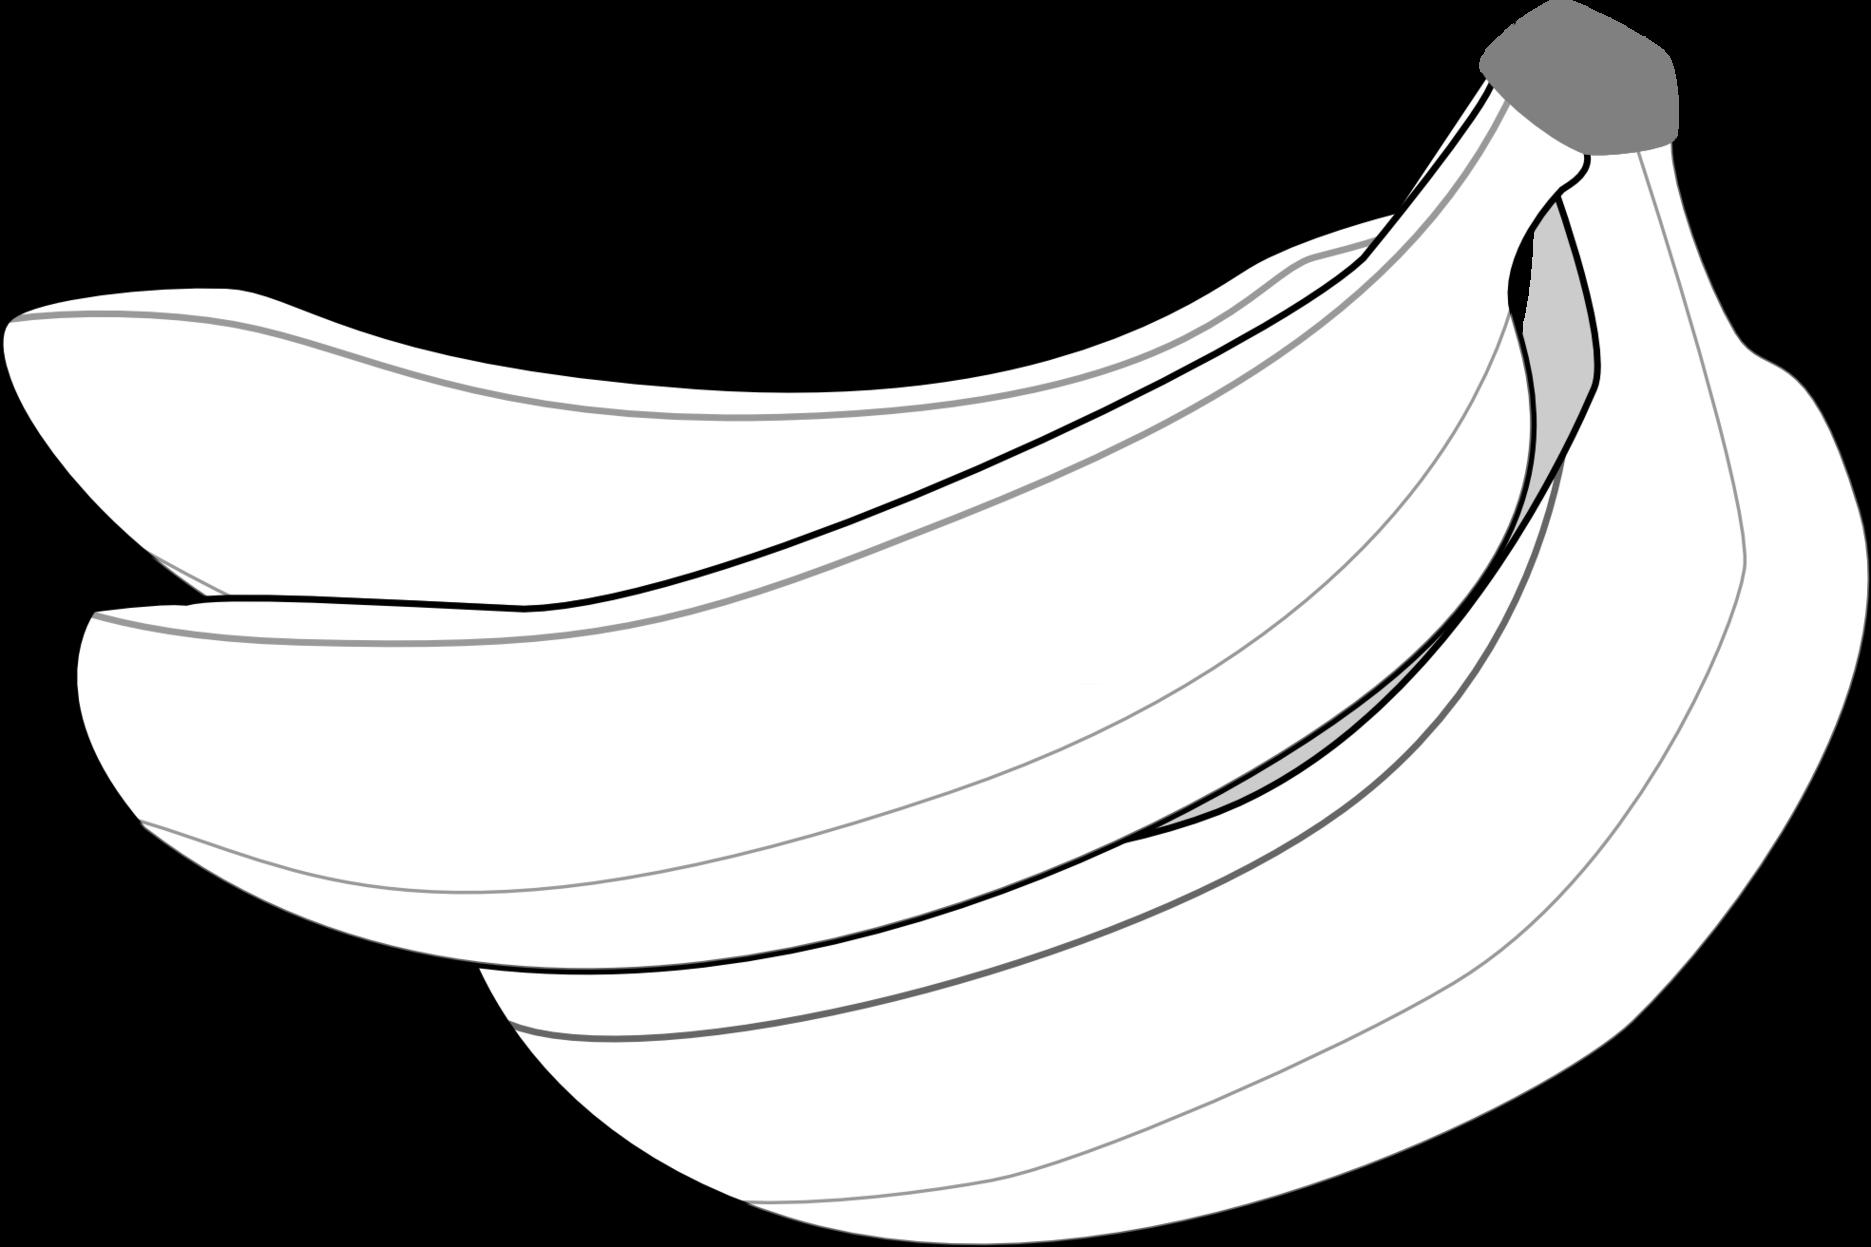 Clipart banana colouring sheet. Coloring pictures of bananas